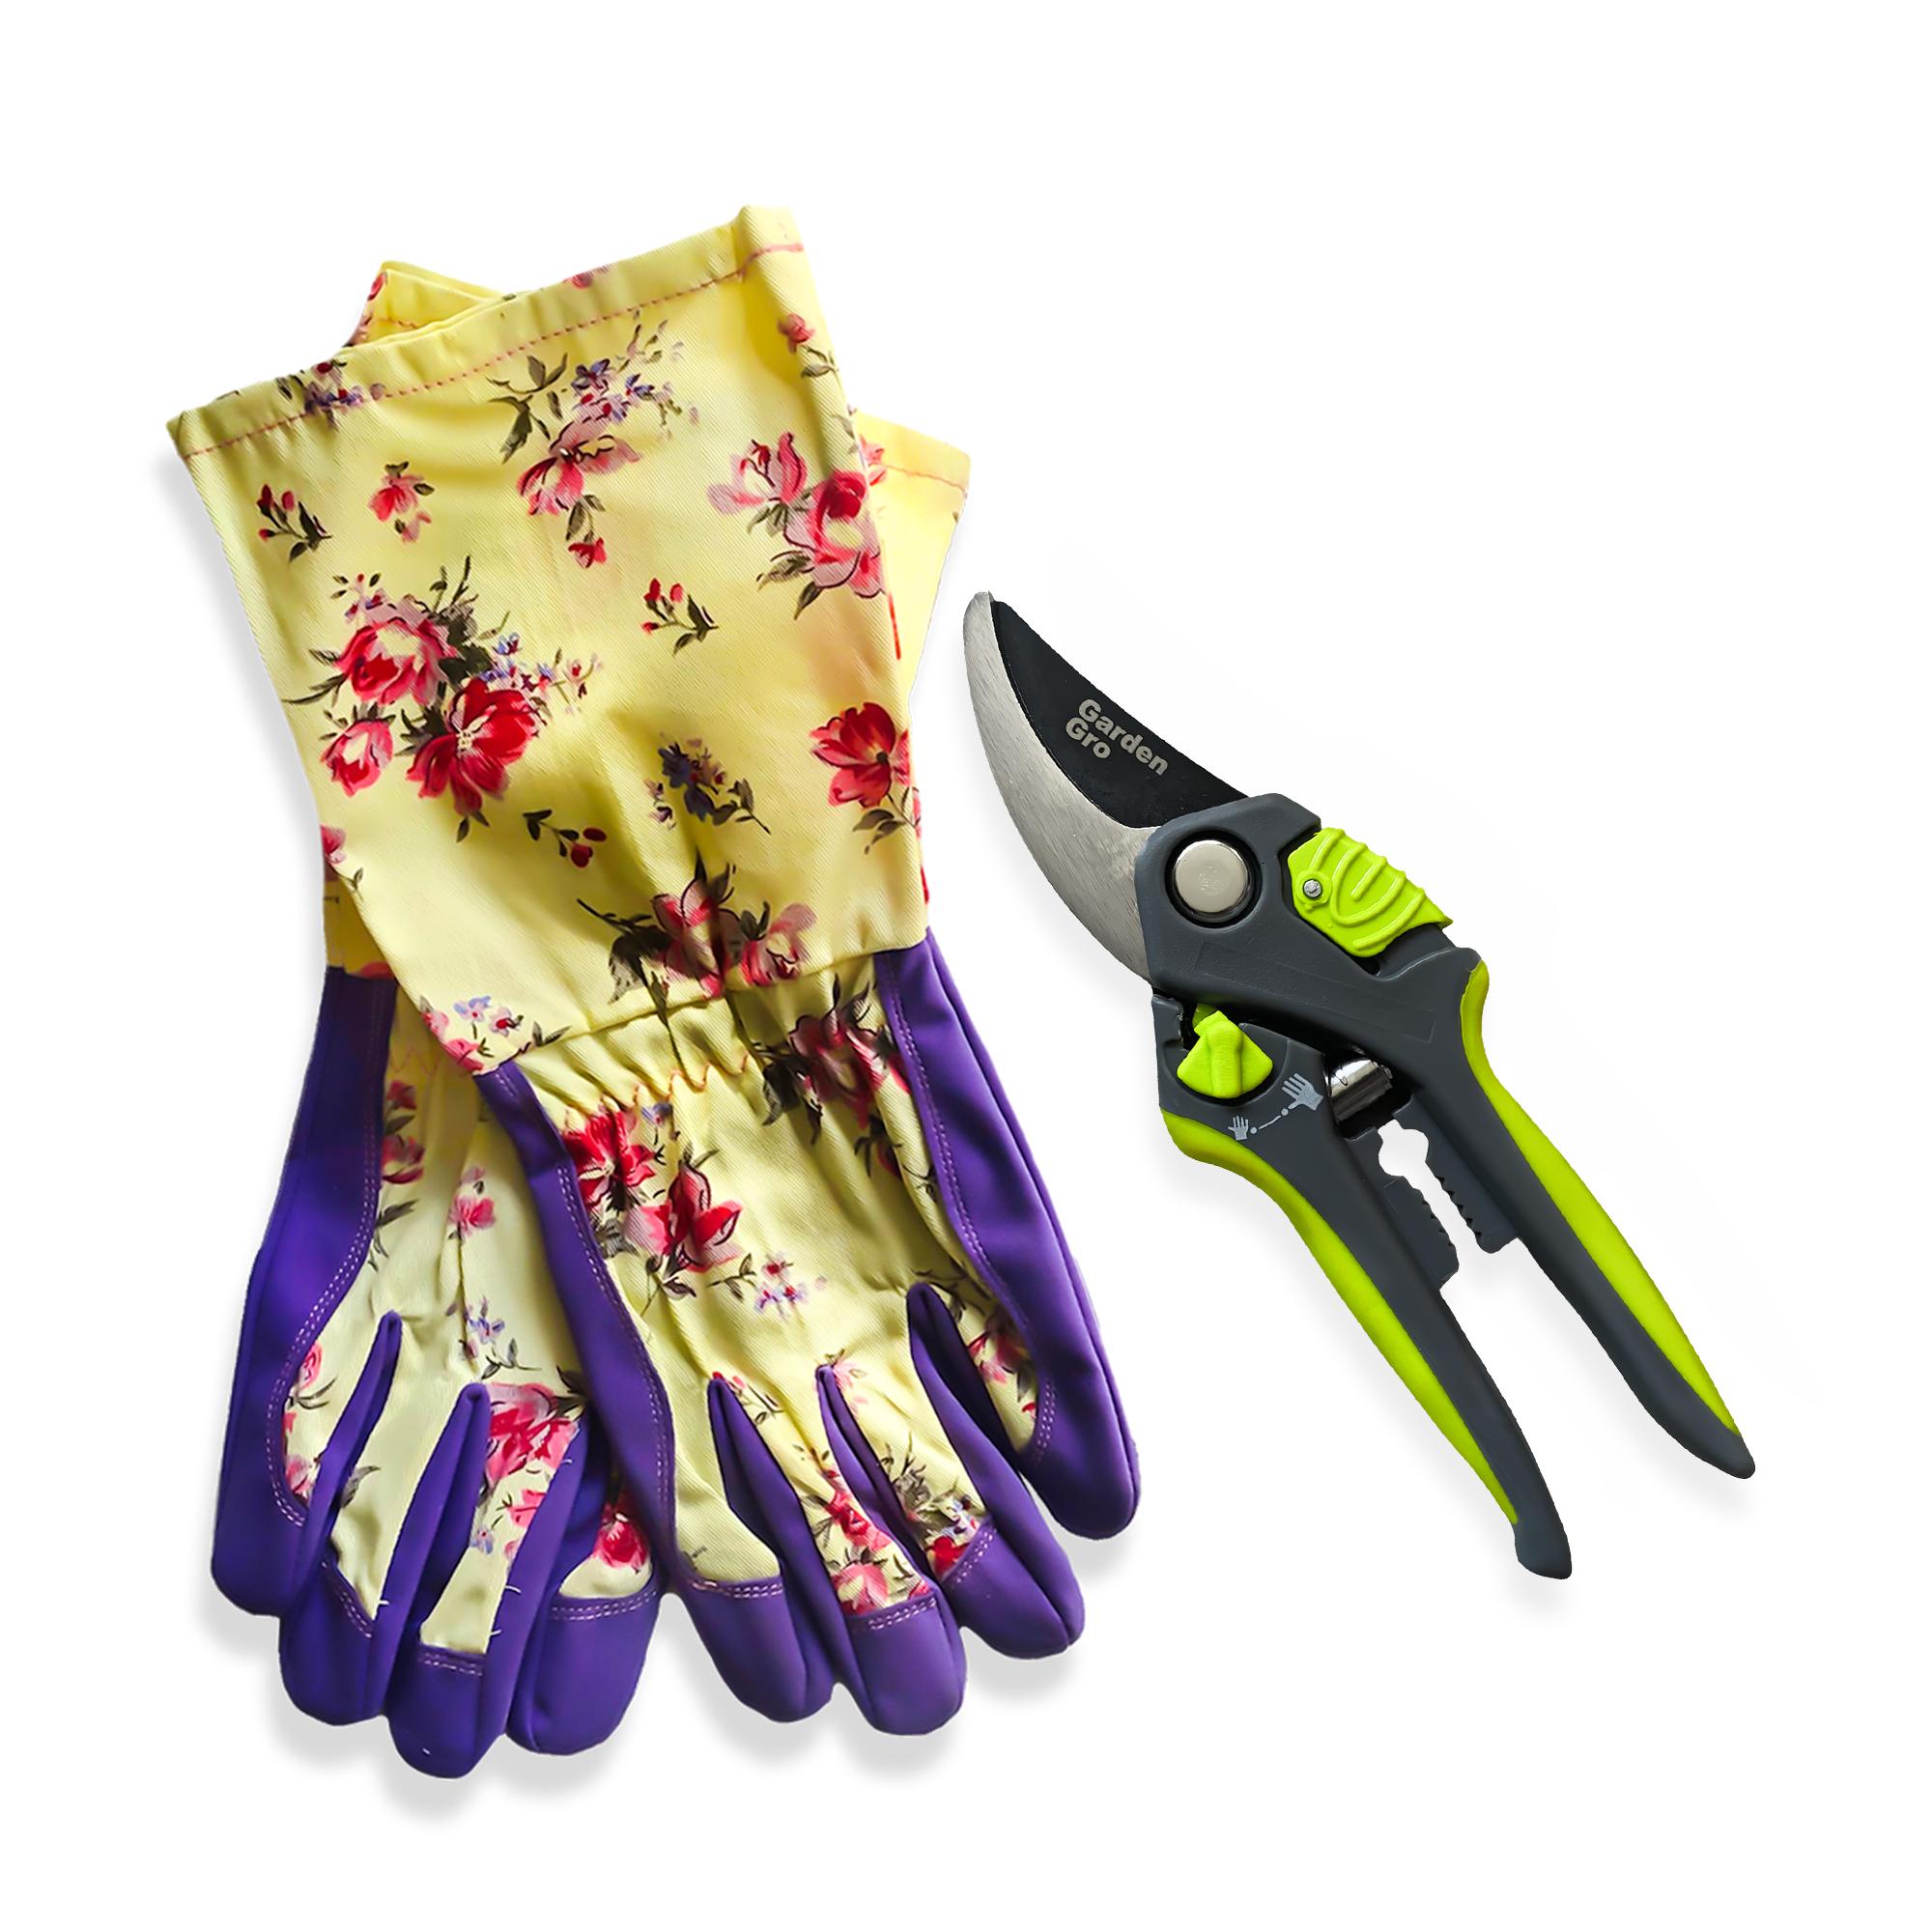 garden-gloves-&-adjustable-bypass-pruner-combo